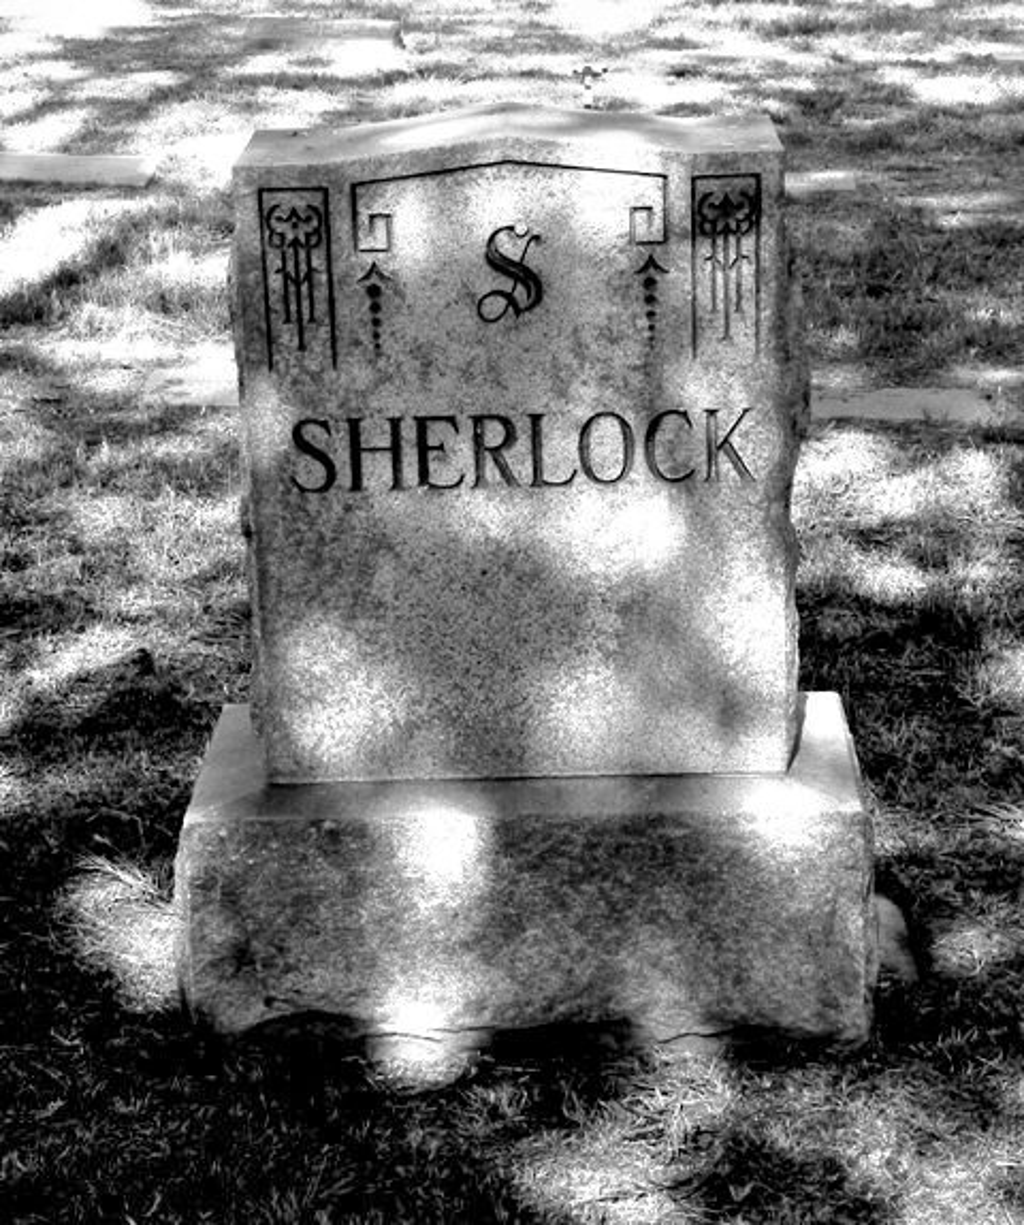 Sherlock by cndglnn